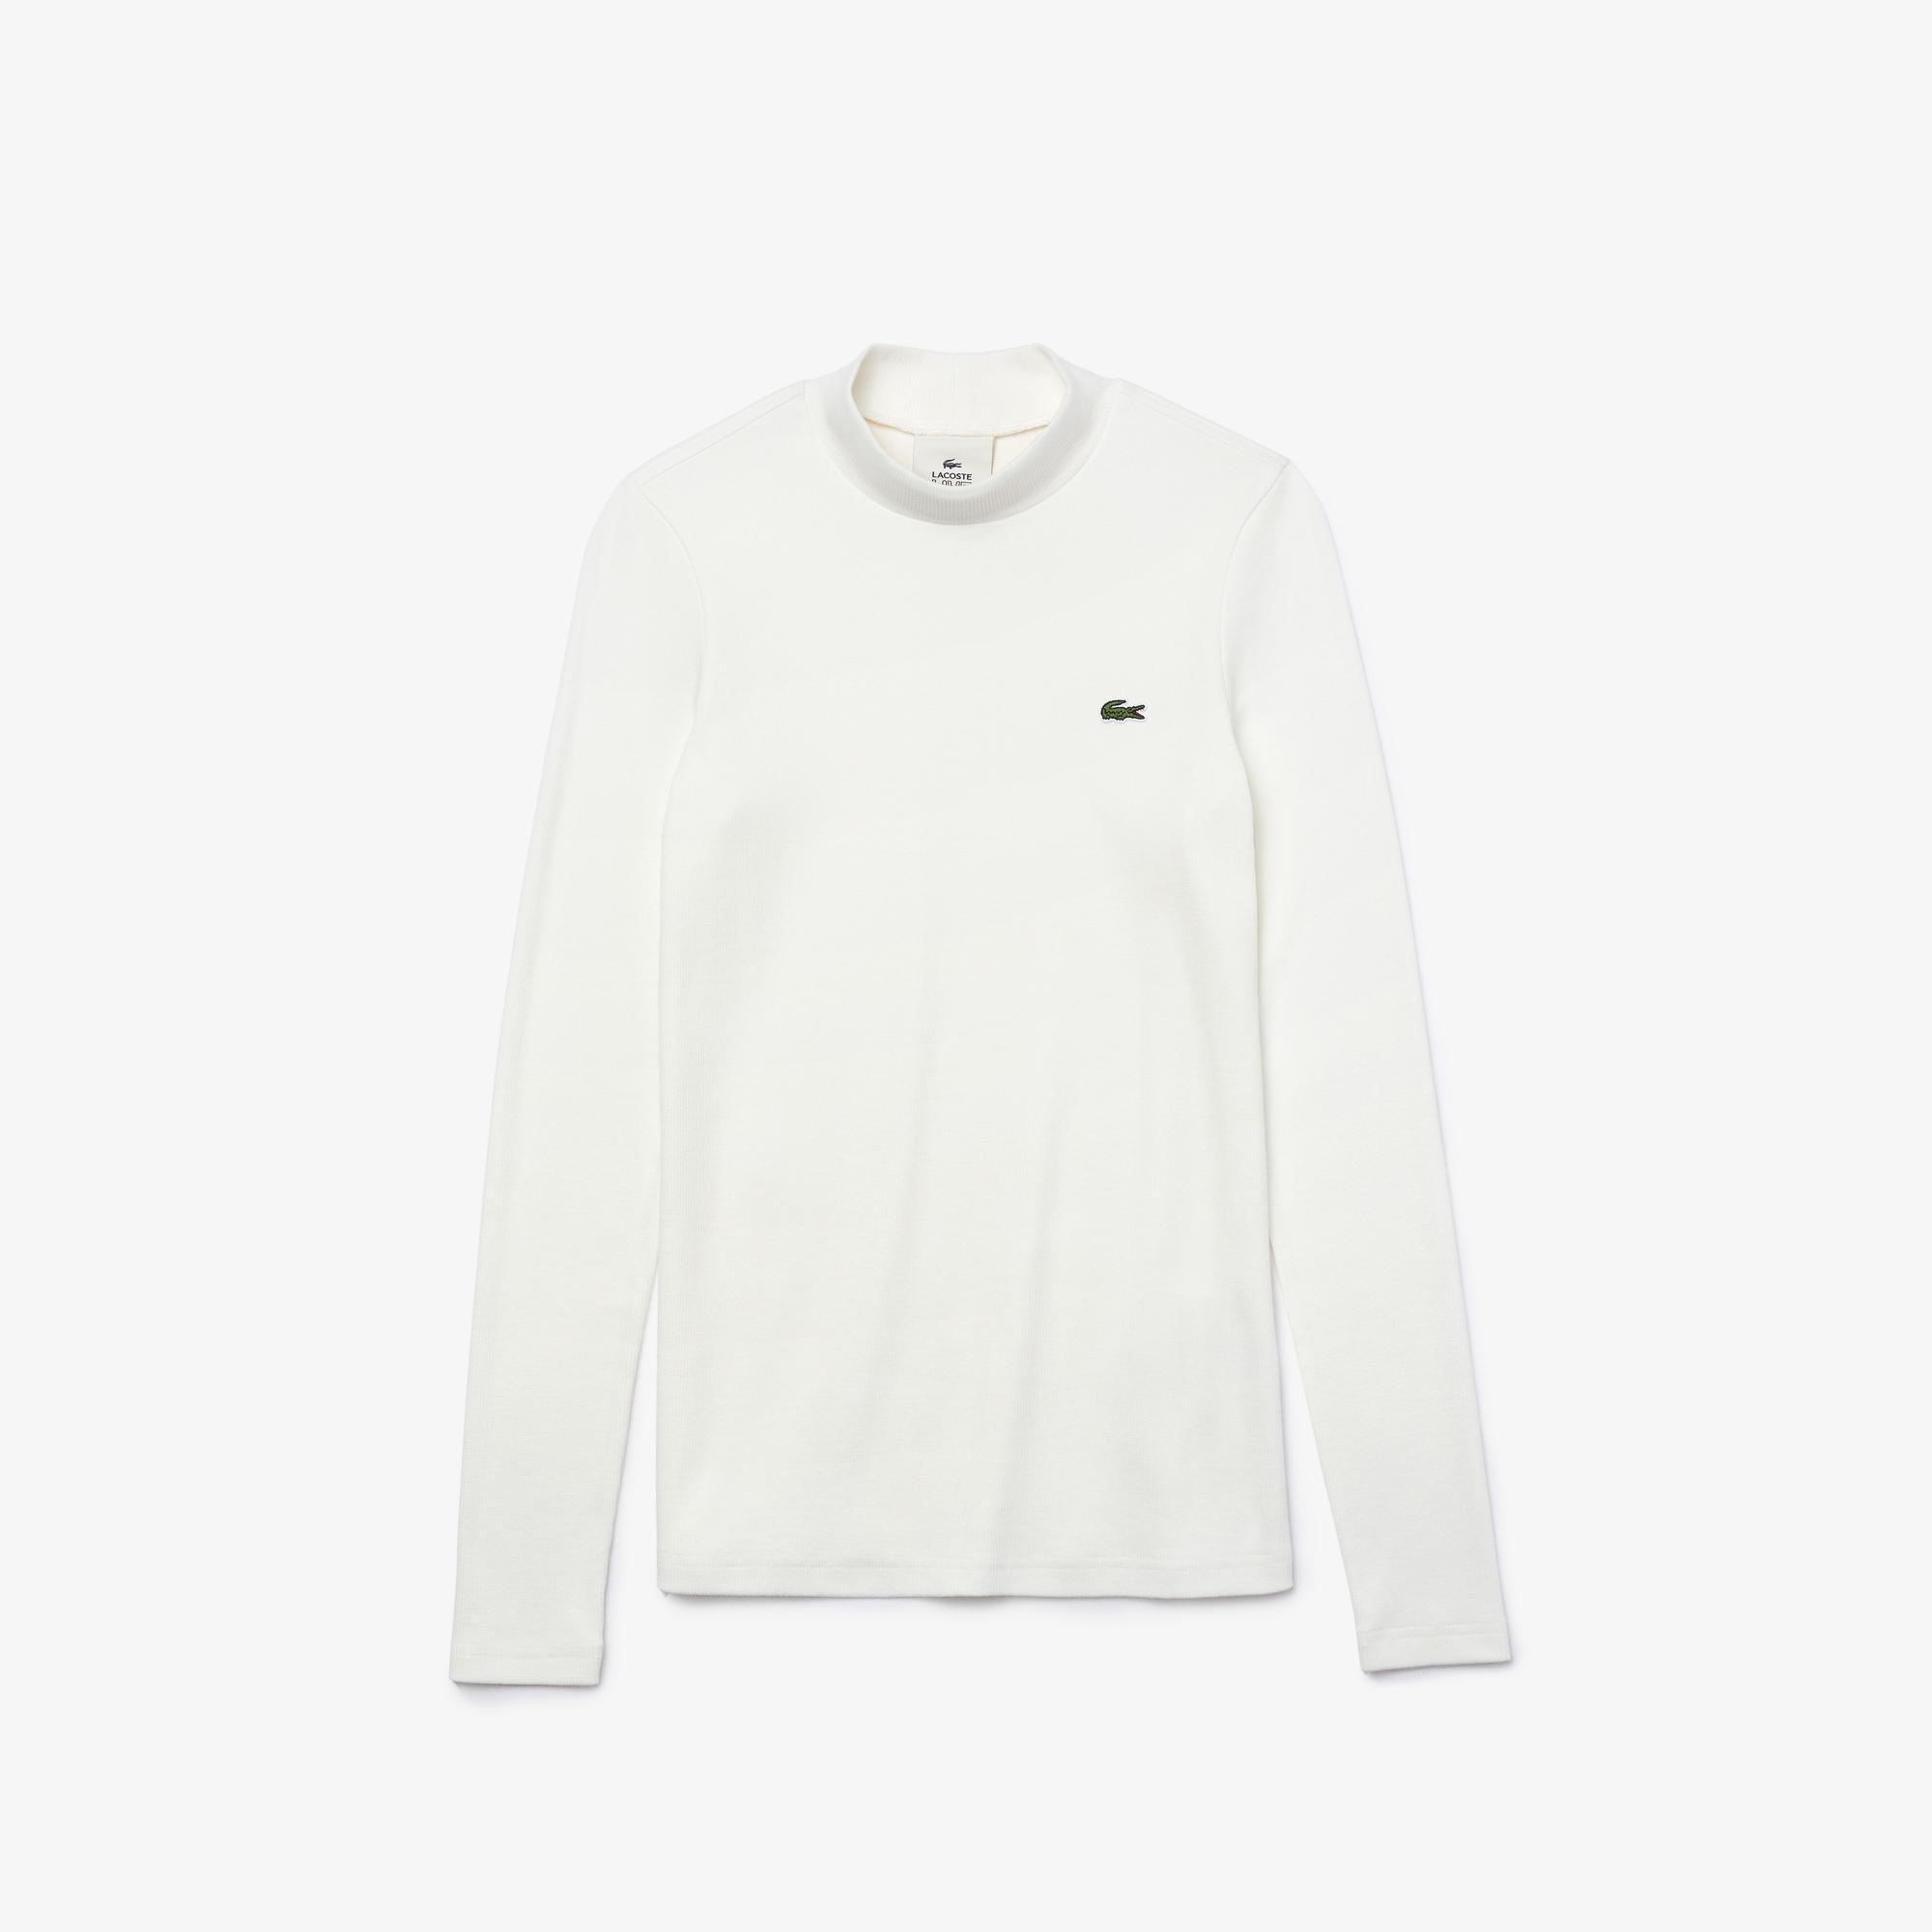 Lacoste Live Damski Lekki Prążkowany T-Shirt Z Bawełny